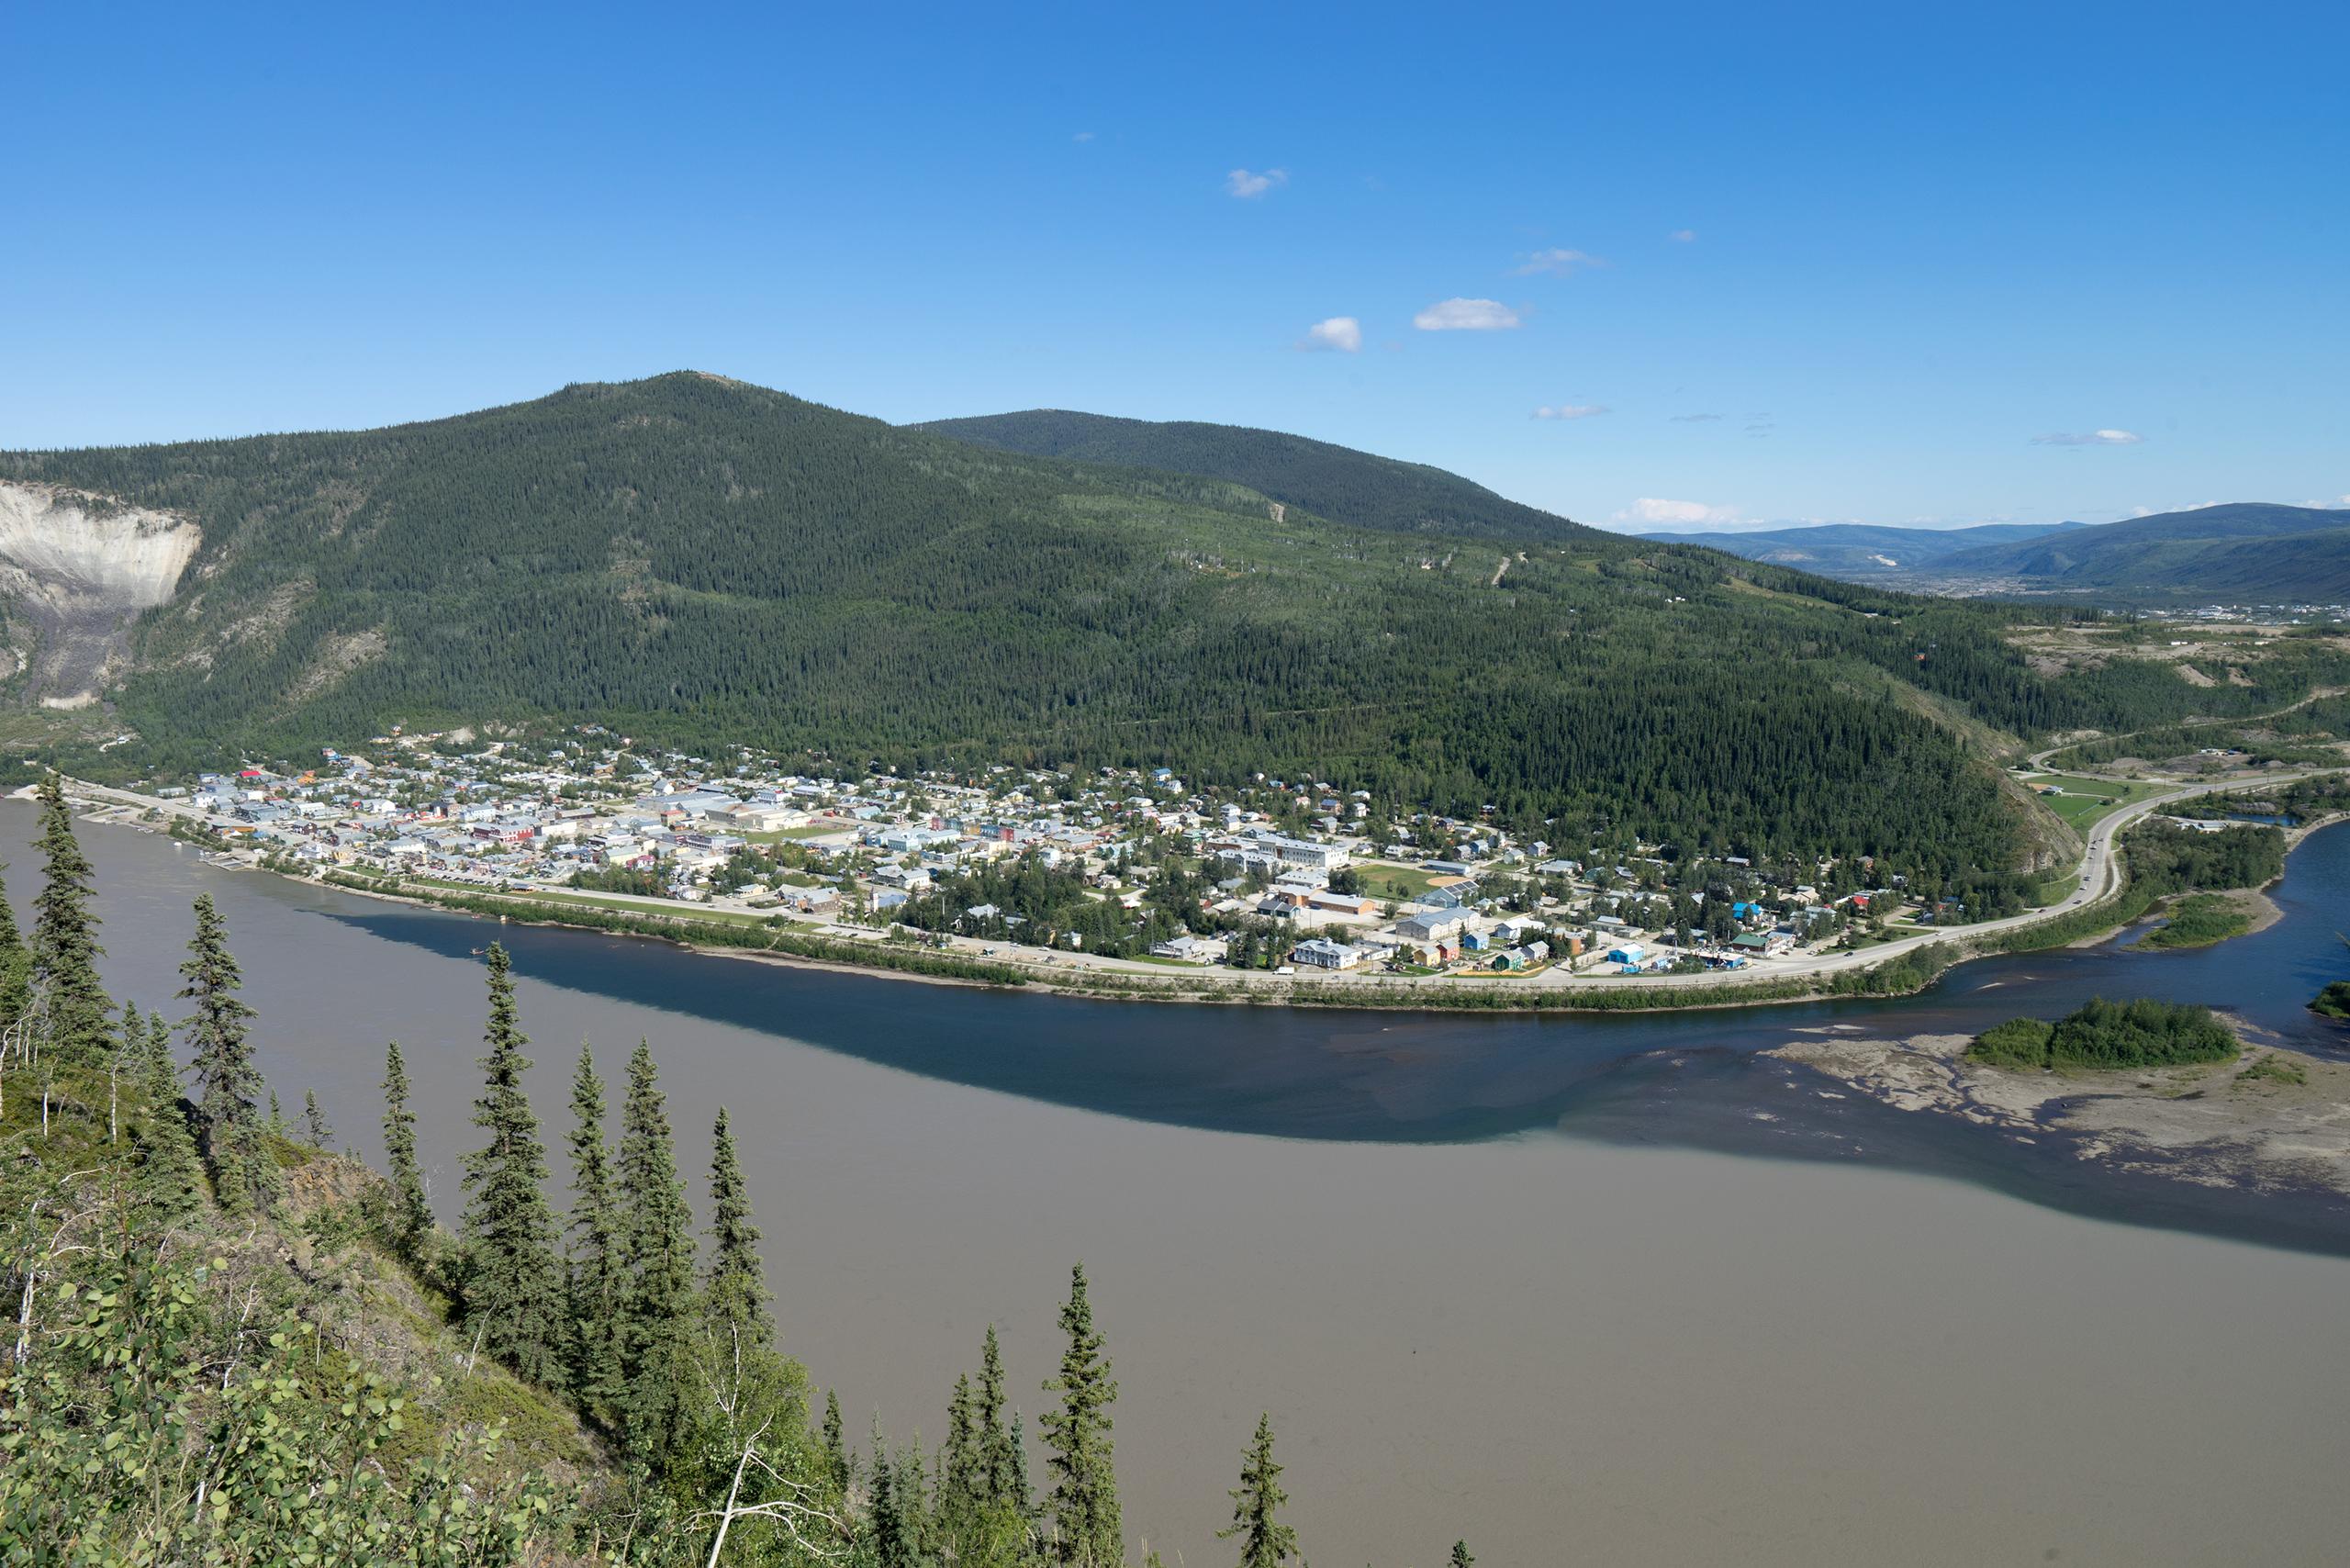 Dawson City and the confluence of the Klondike River (dark, clean) and Yukon River (light, muddy)   Photo: Matthias Ries